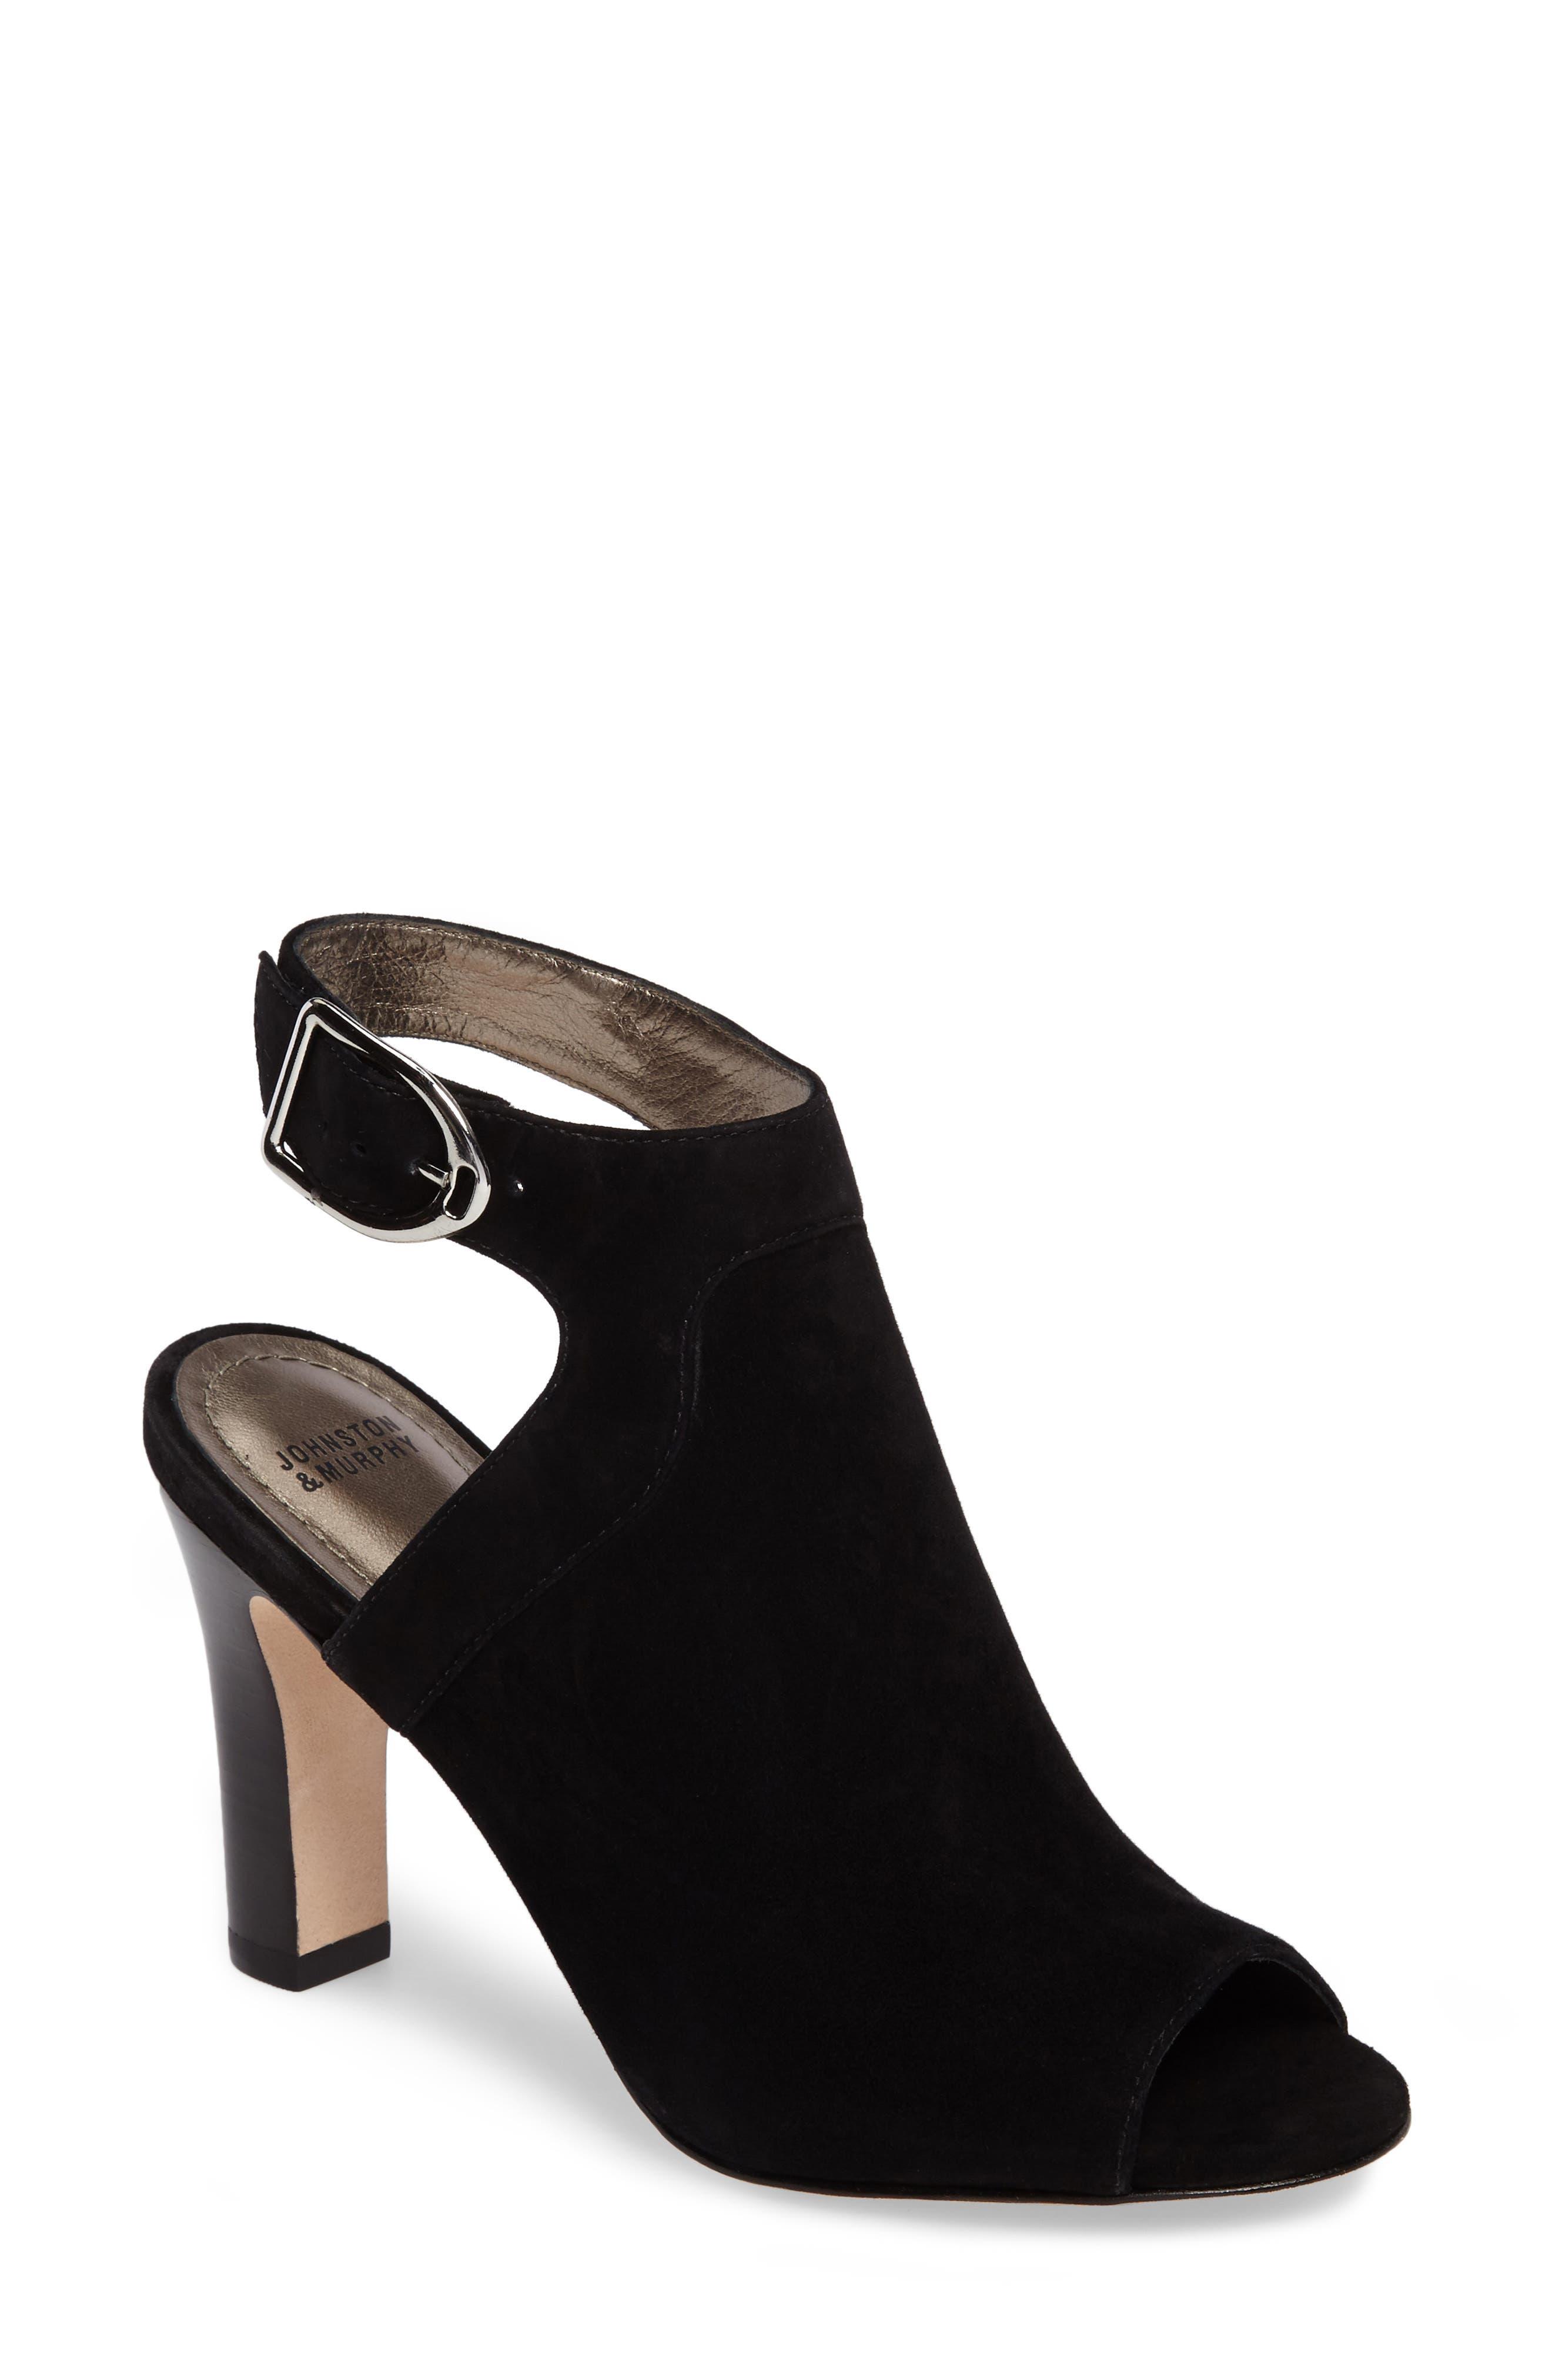 Cassie Peep Toe Sandal,                         Main,                         color, BLACK LEATHER